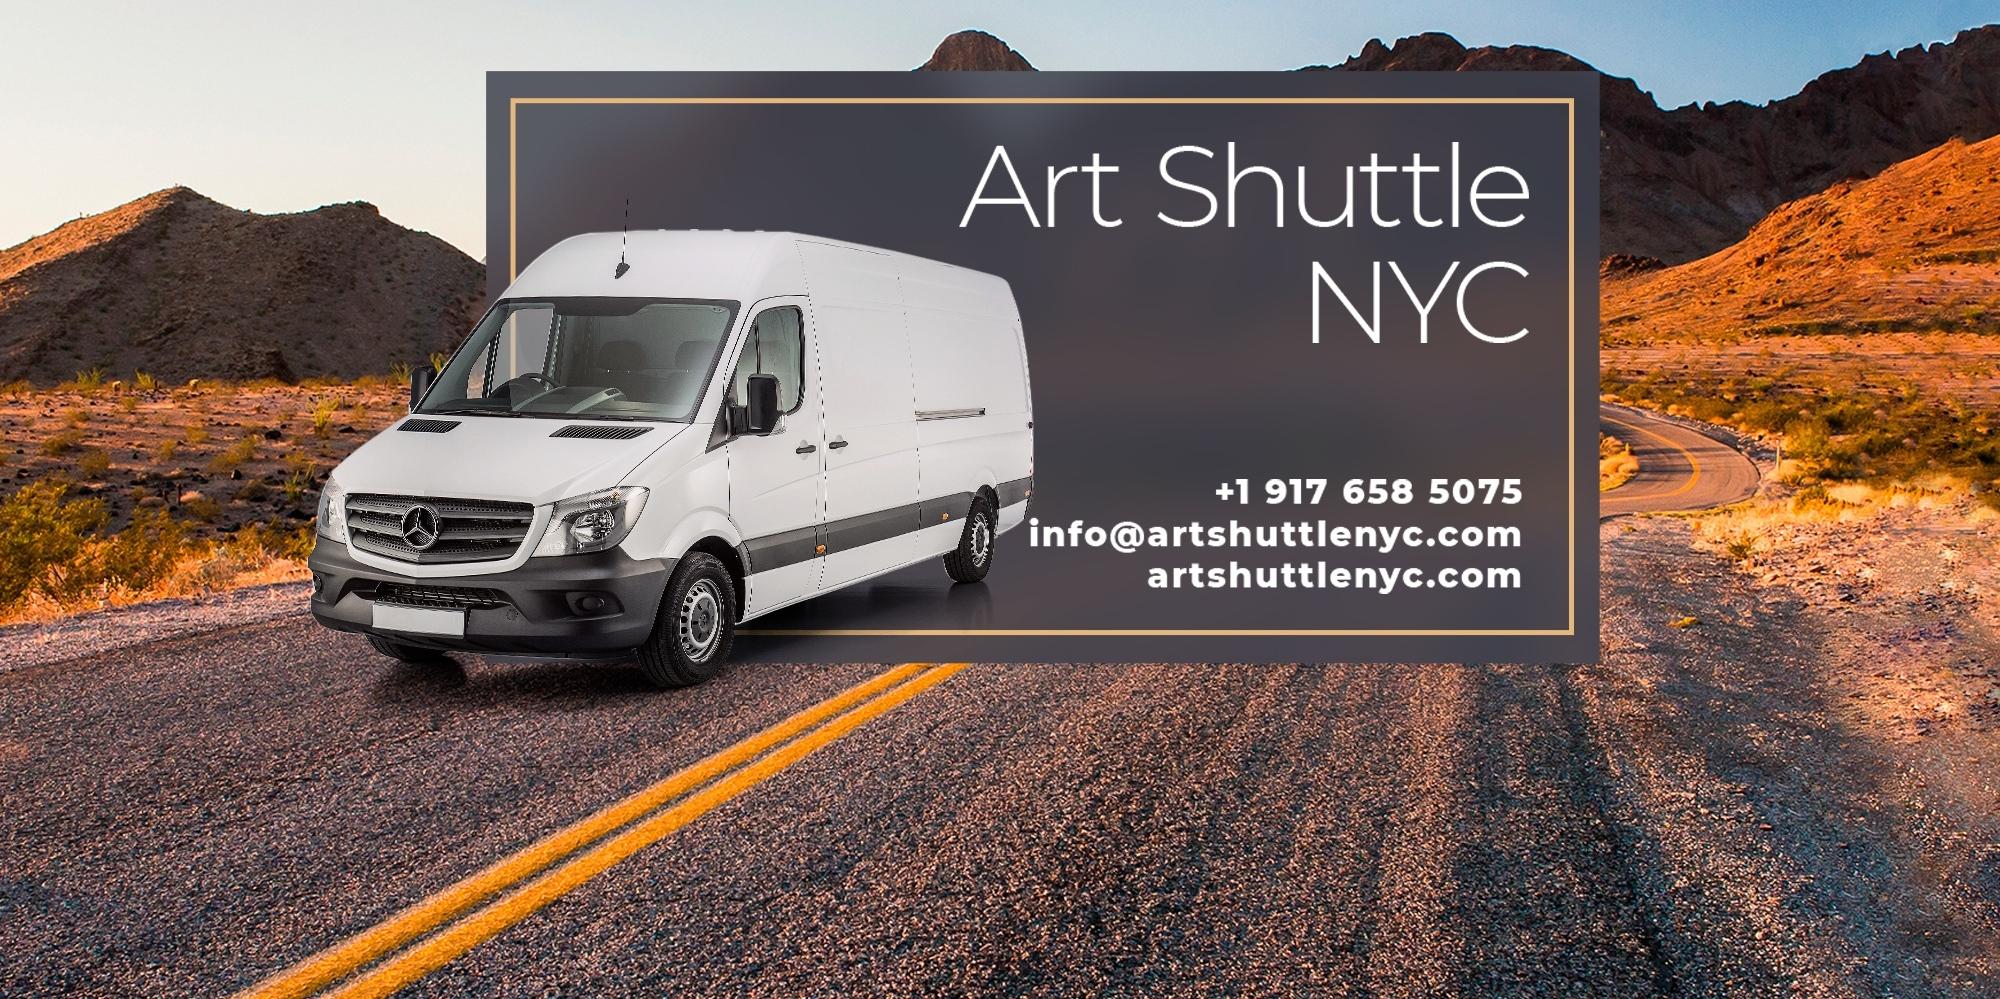 Art Shuttle NYC